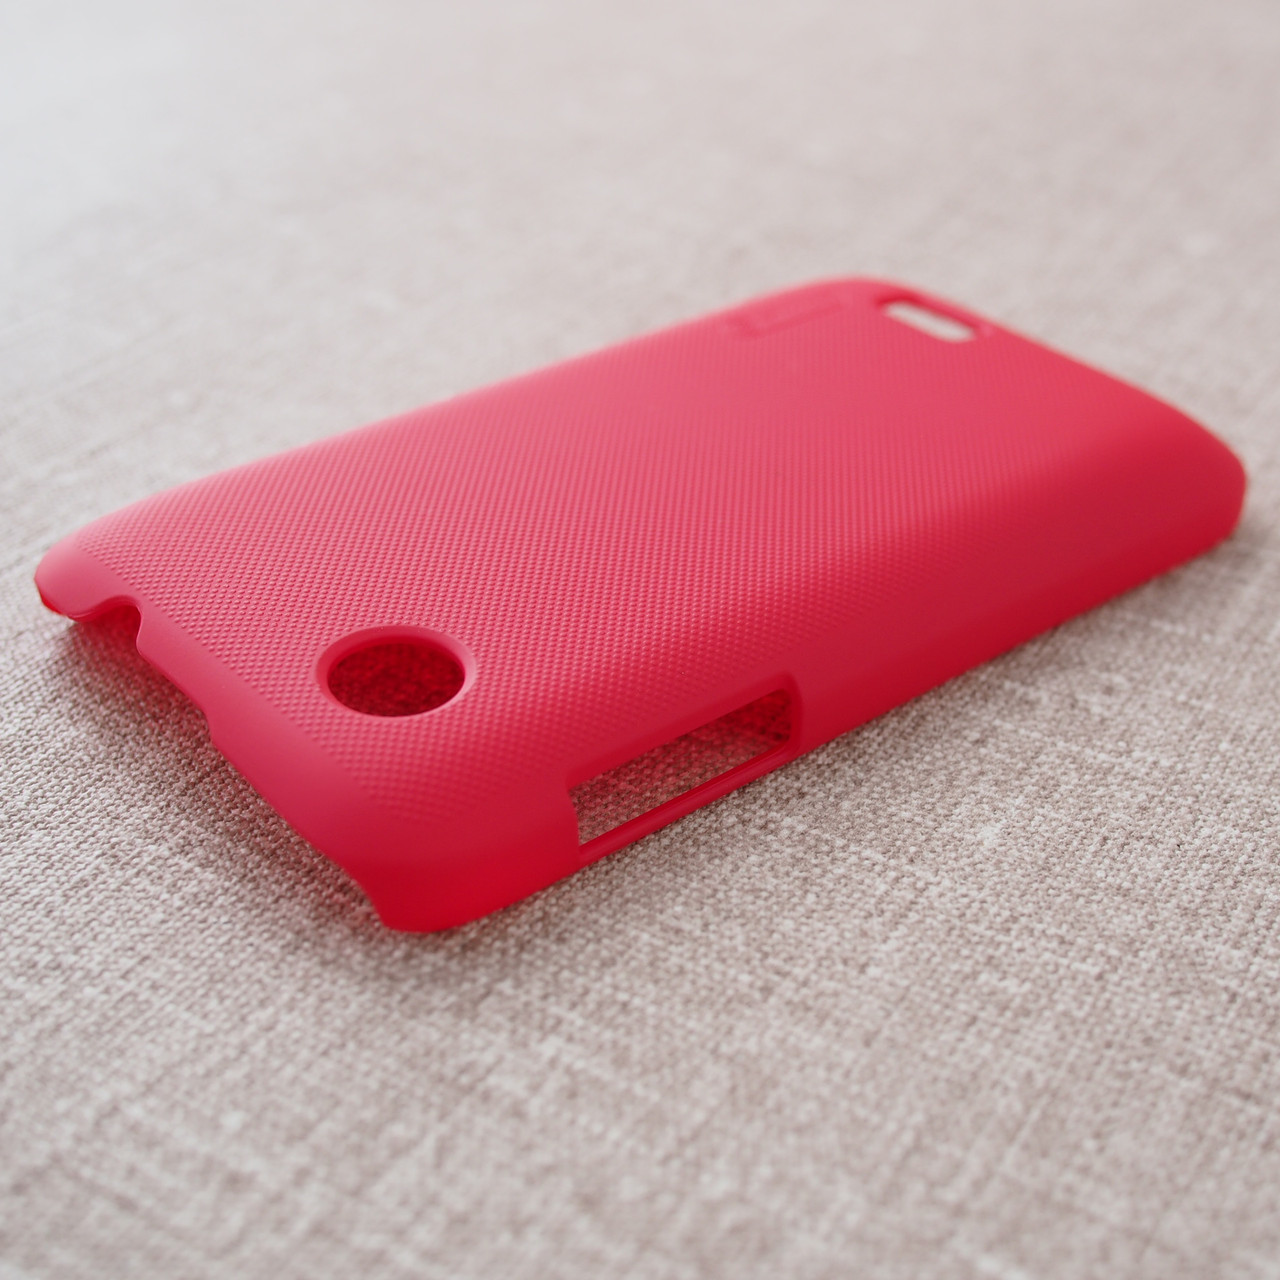 Чехлы для других смартфонов Nillkin Super Frosted Shield Lenovo A369 red Для телефона